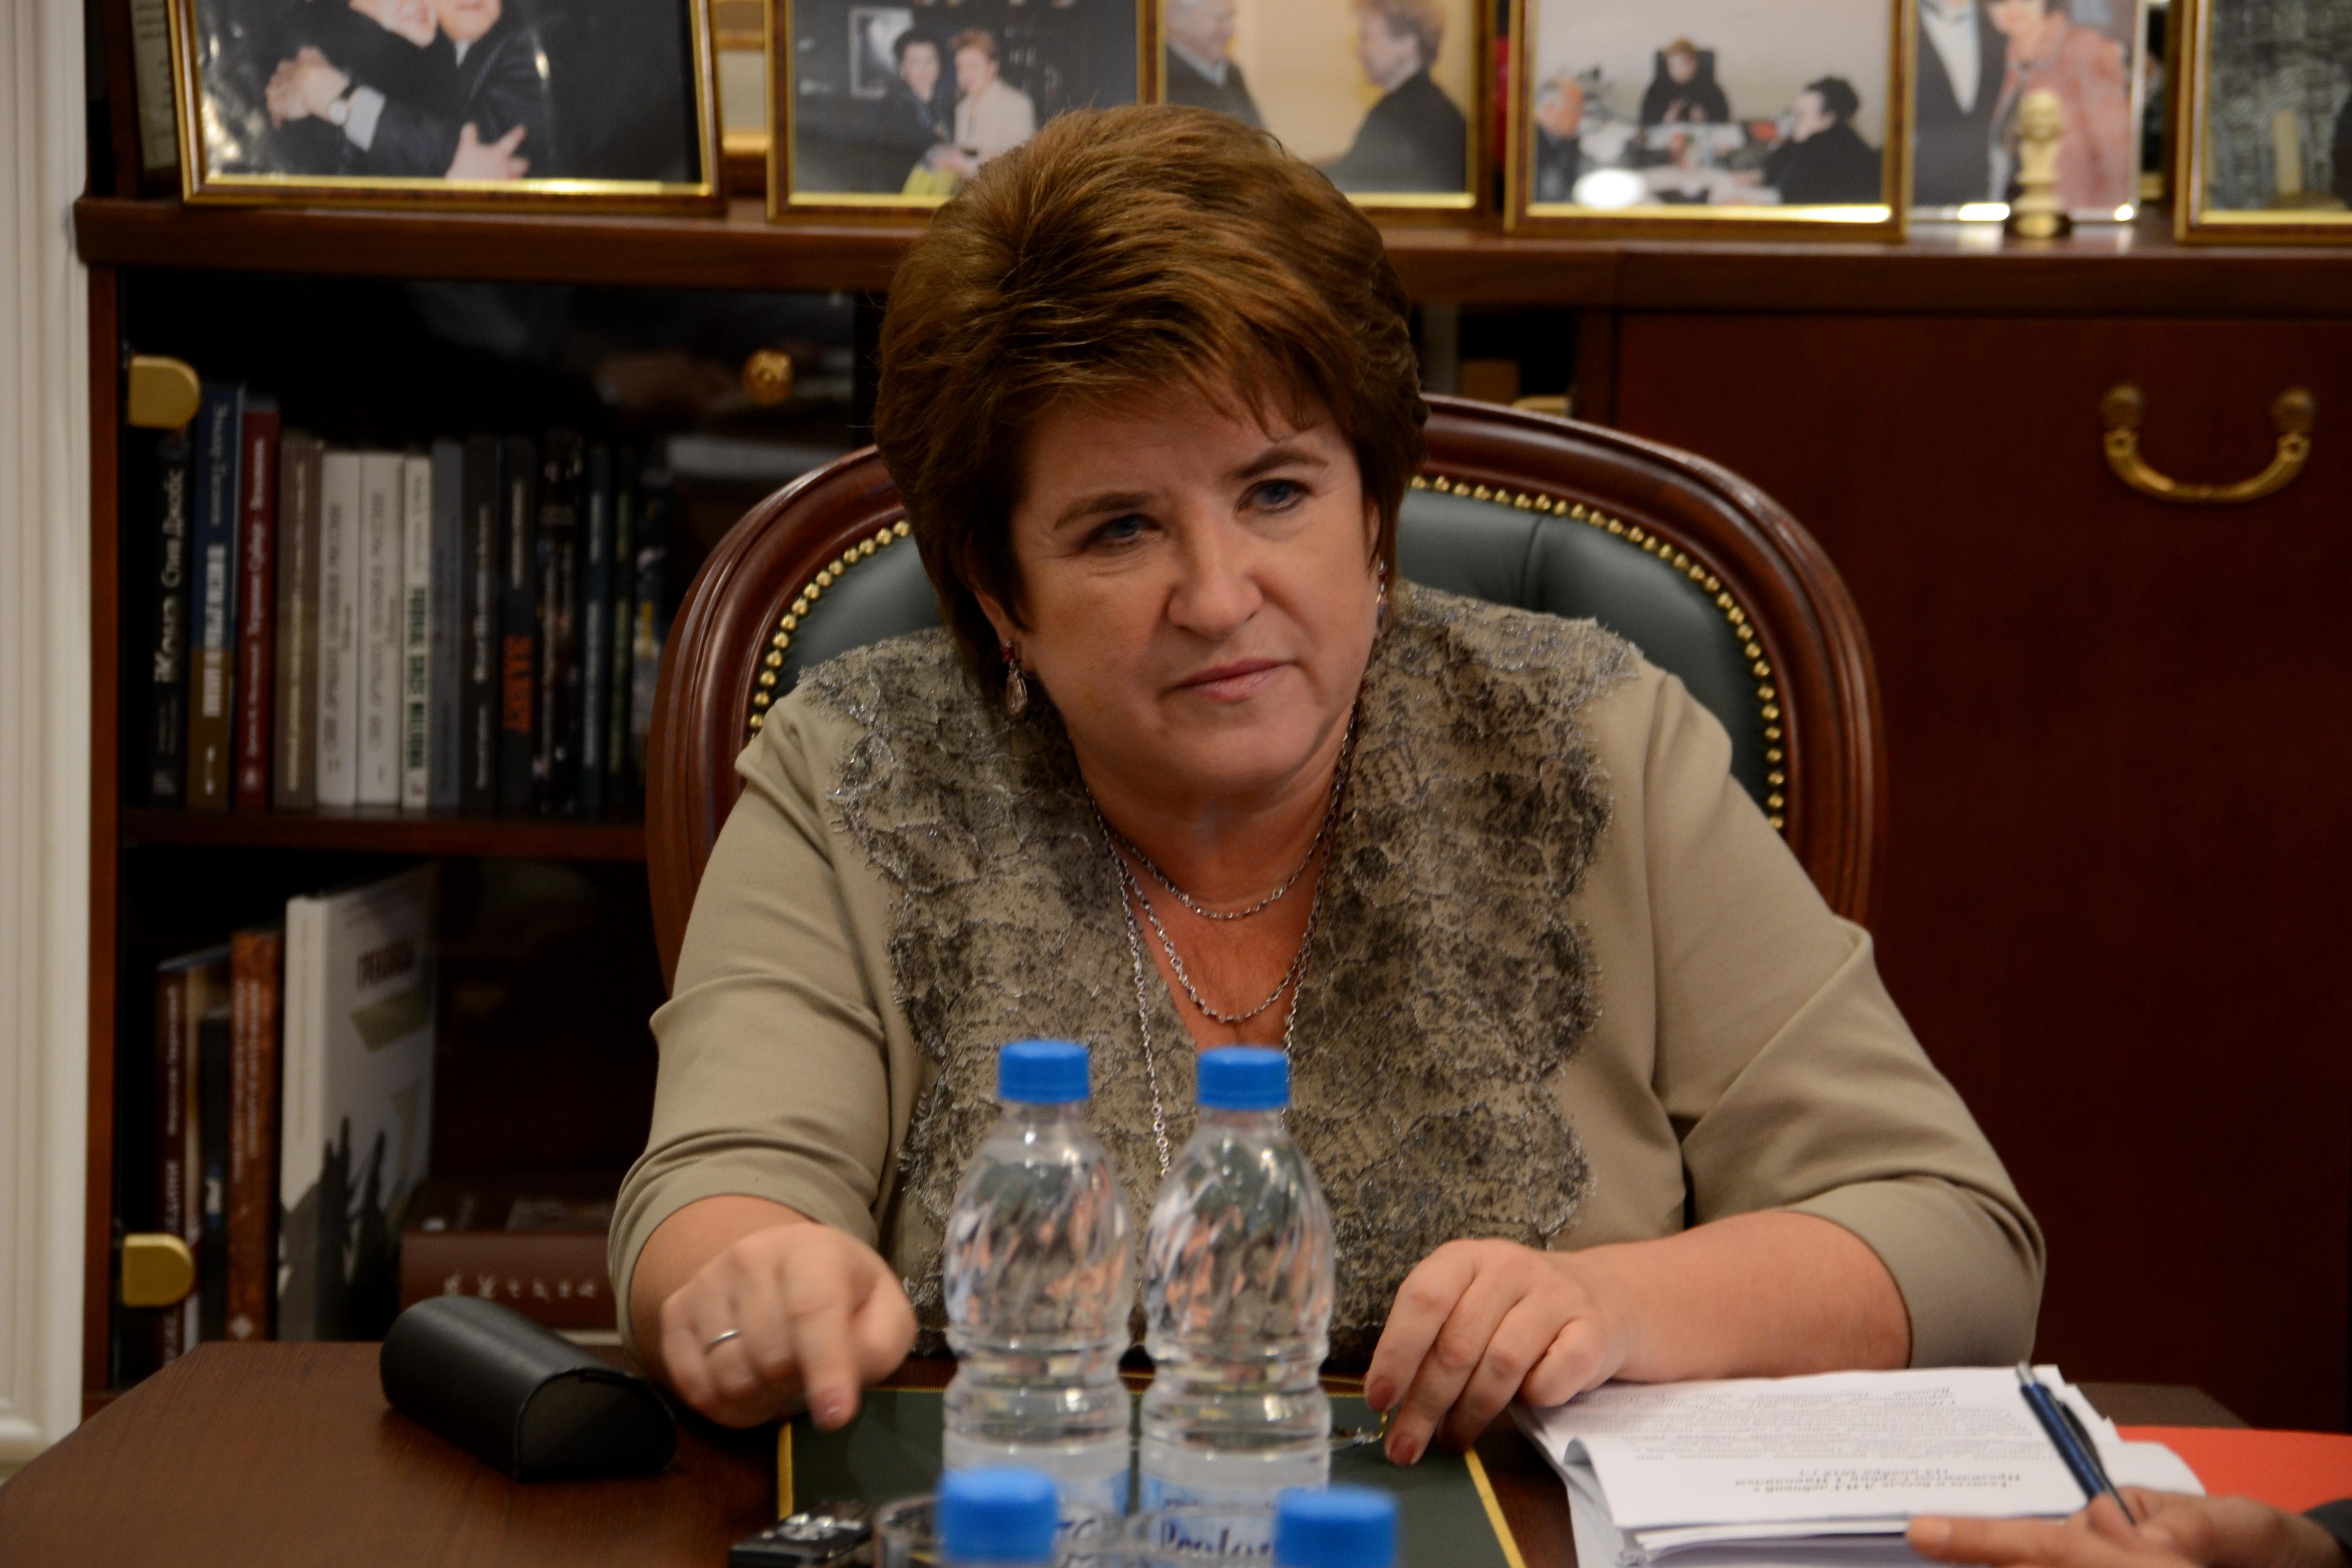 Direktorica zvezne agencije Rossotrudničestvo Ljubov Glebova. Vir: Alina Jabločkina.